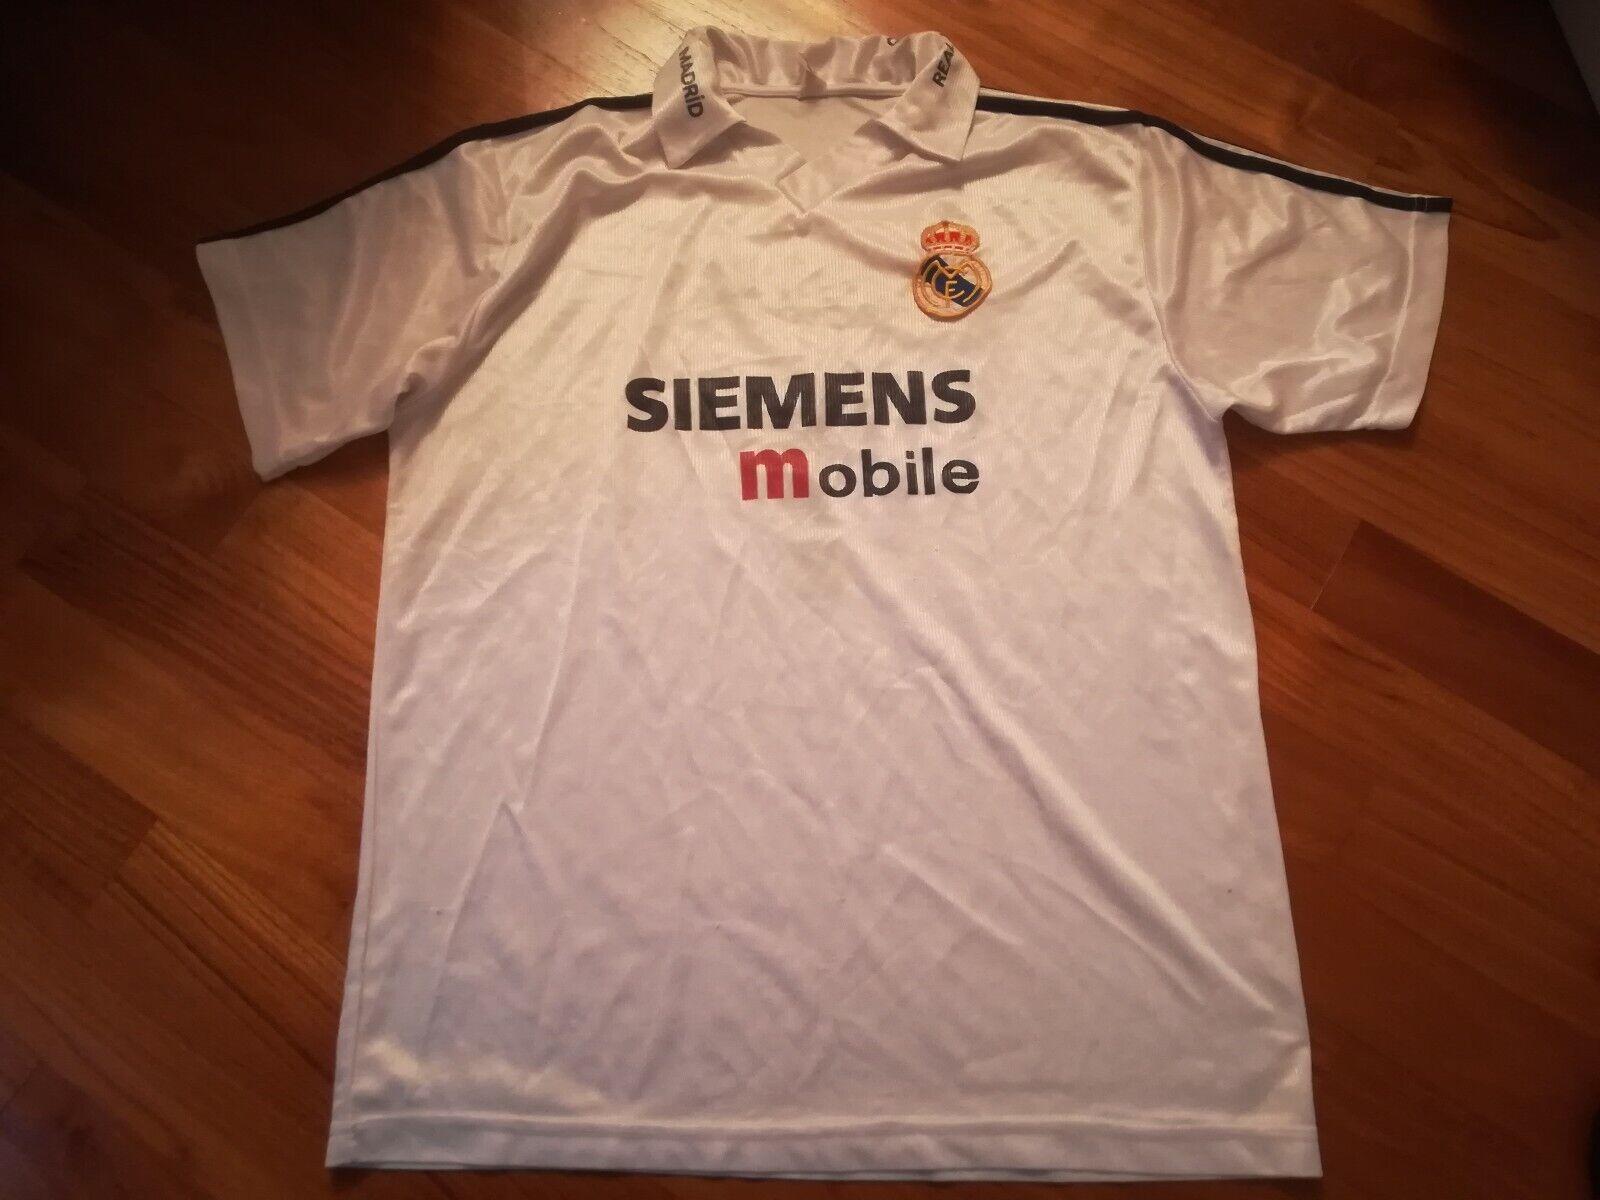 Maglia maillot shirt calcio football no matchworn REAL MADRID camiseta soccer